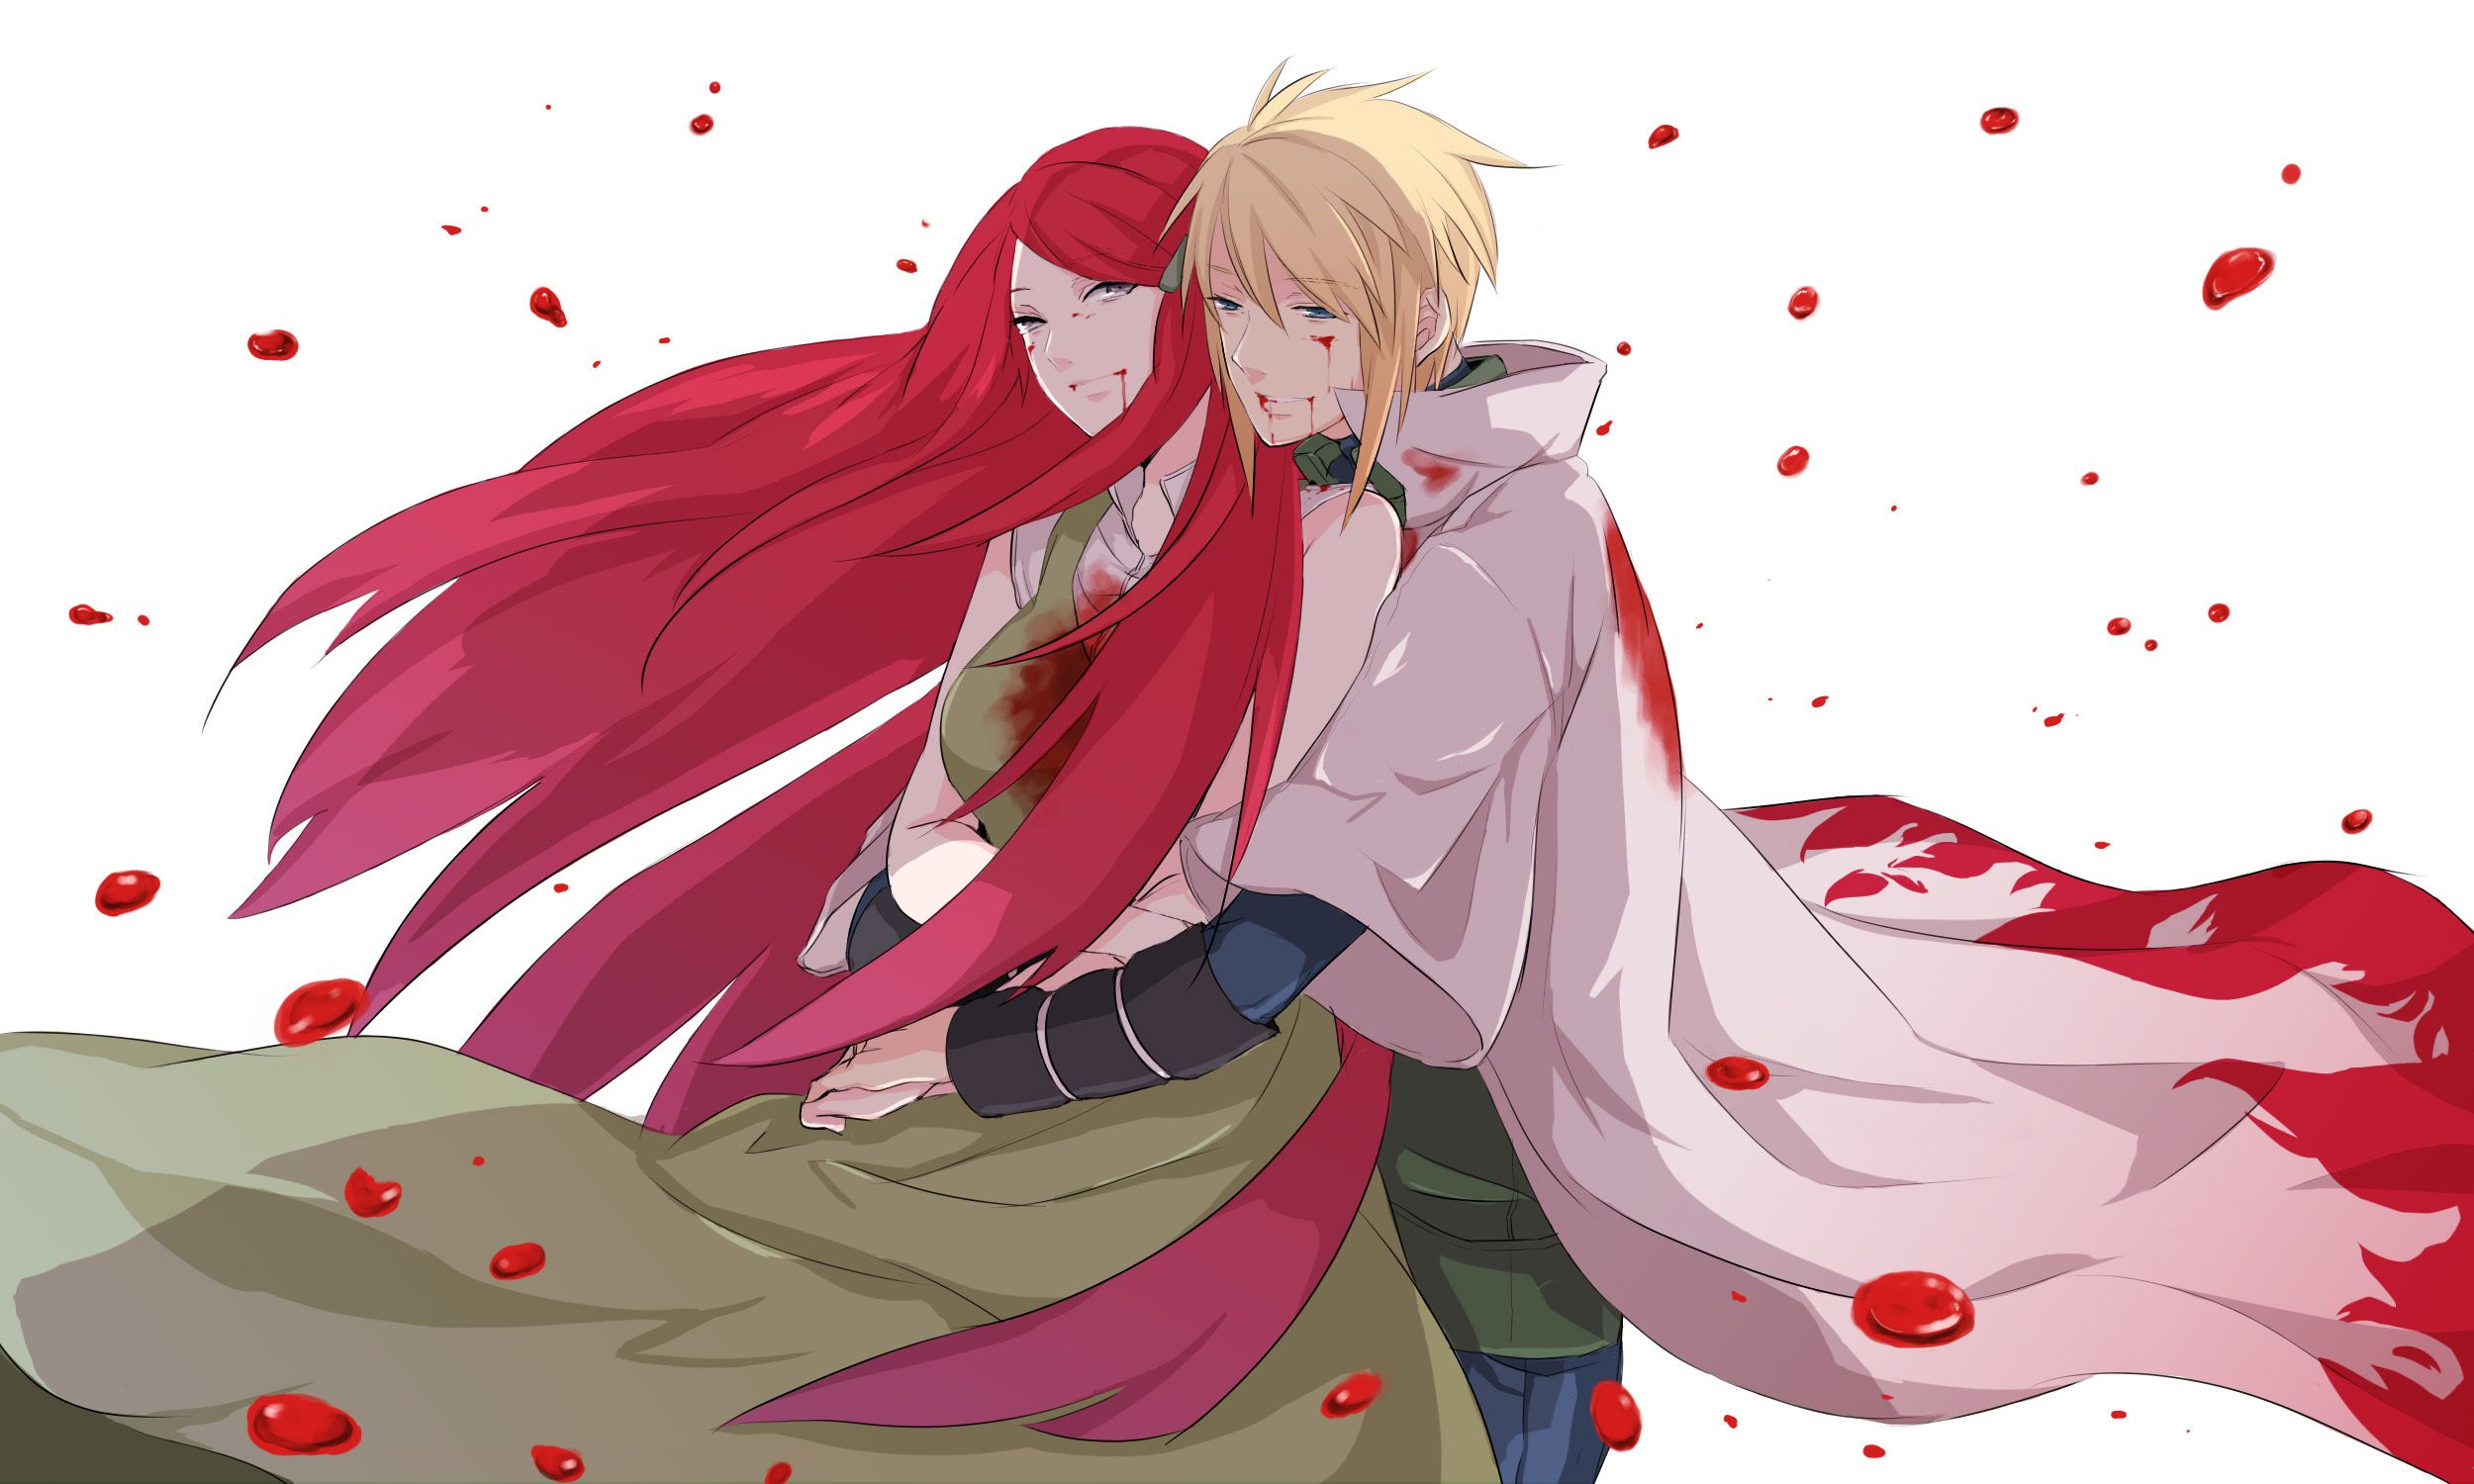 Must see Wallpaper Naruto Couple - 0906c92651911e22f555be98646ae0ed  Image_52448.jpg